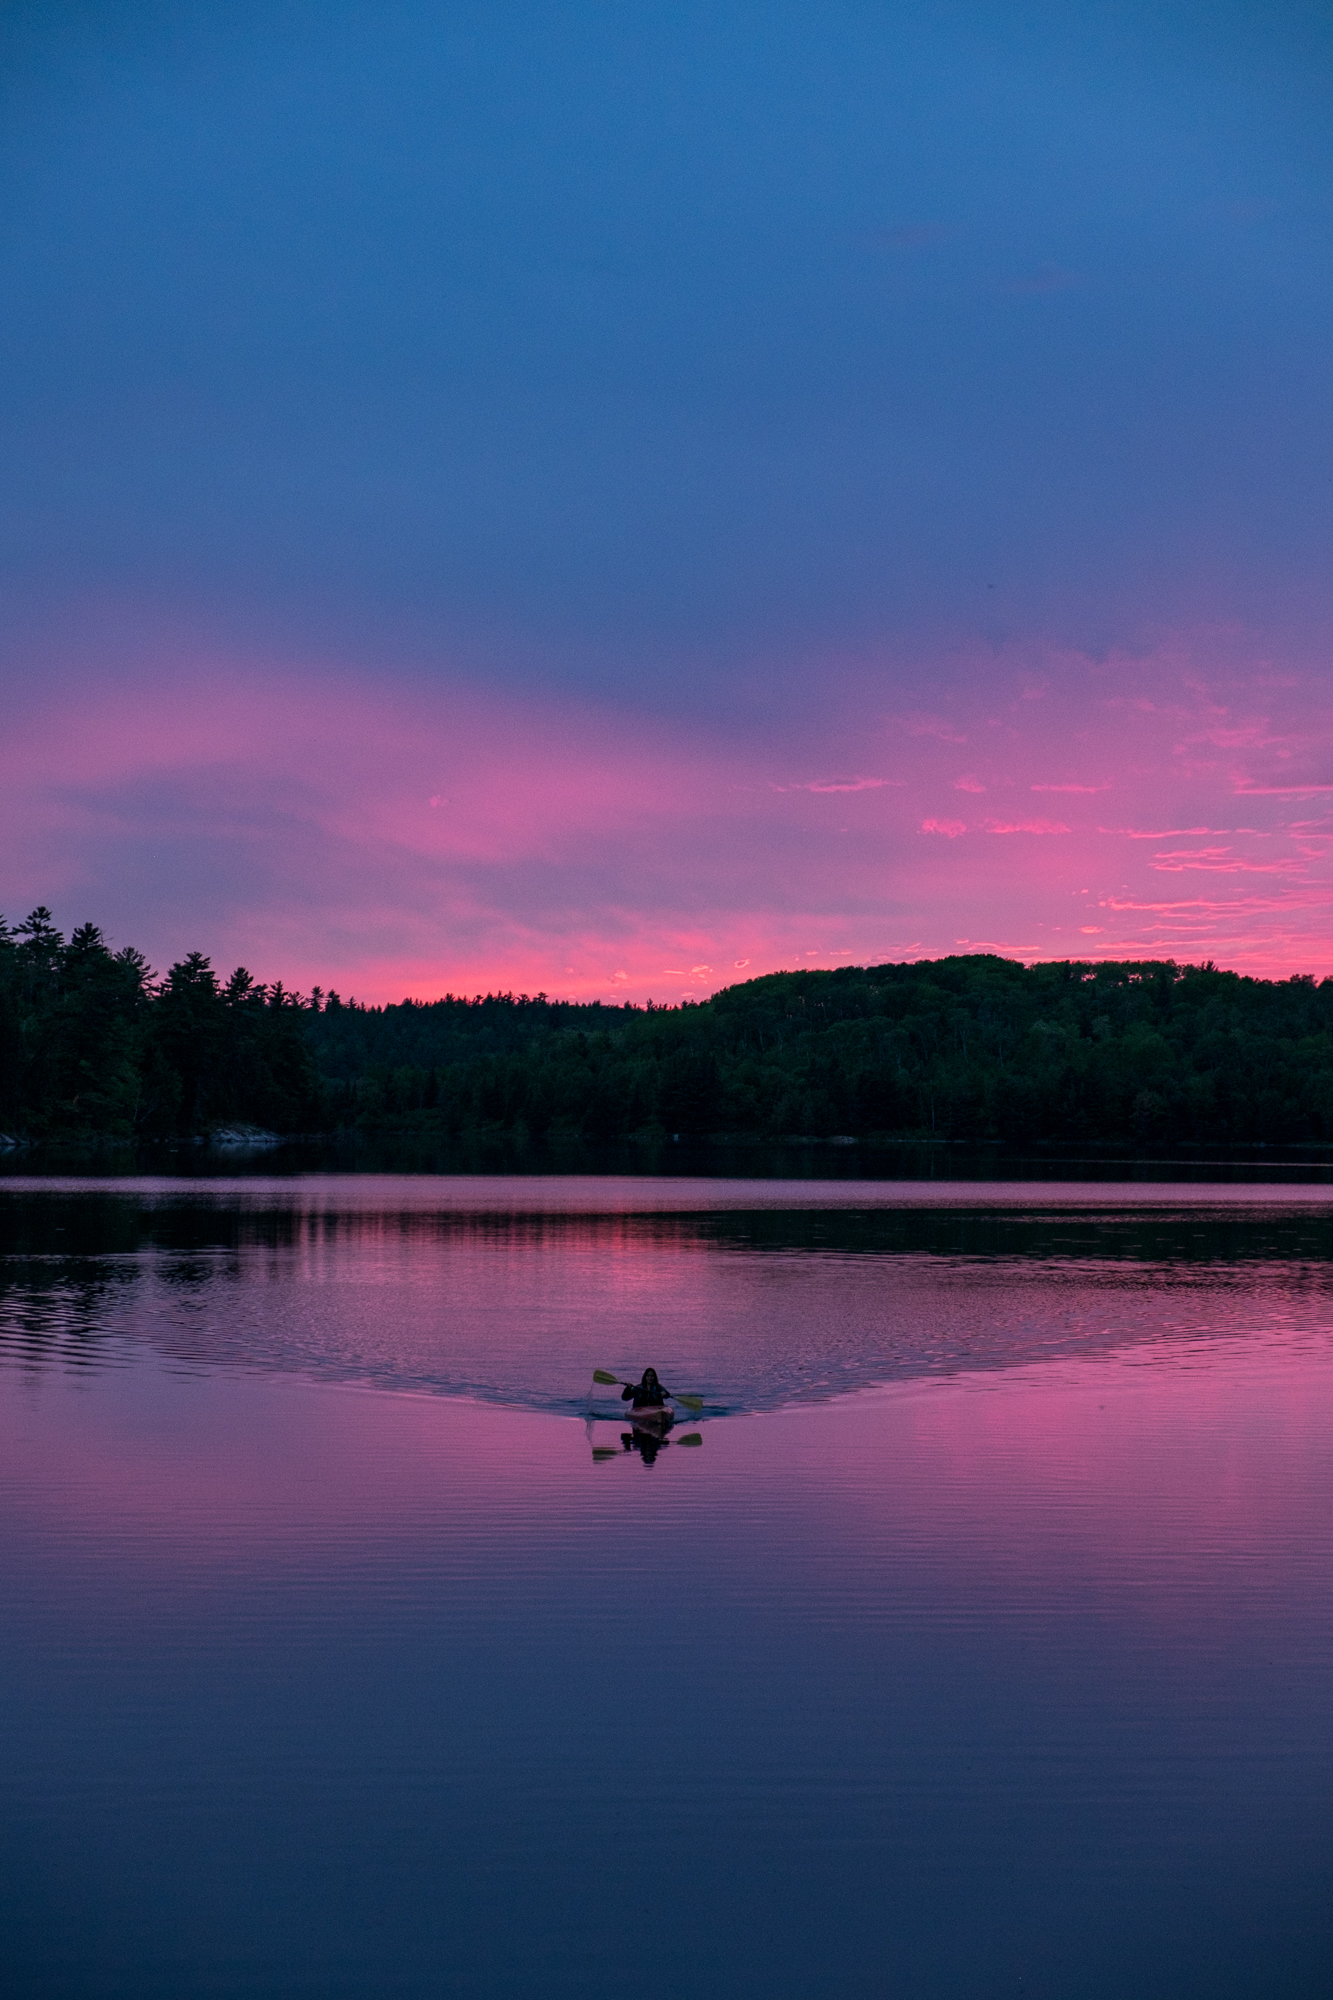 Stef paddling in before it gets too dark. We loved our experience in Voyageurs National Park! Onward..